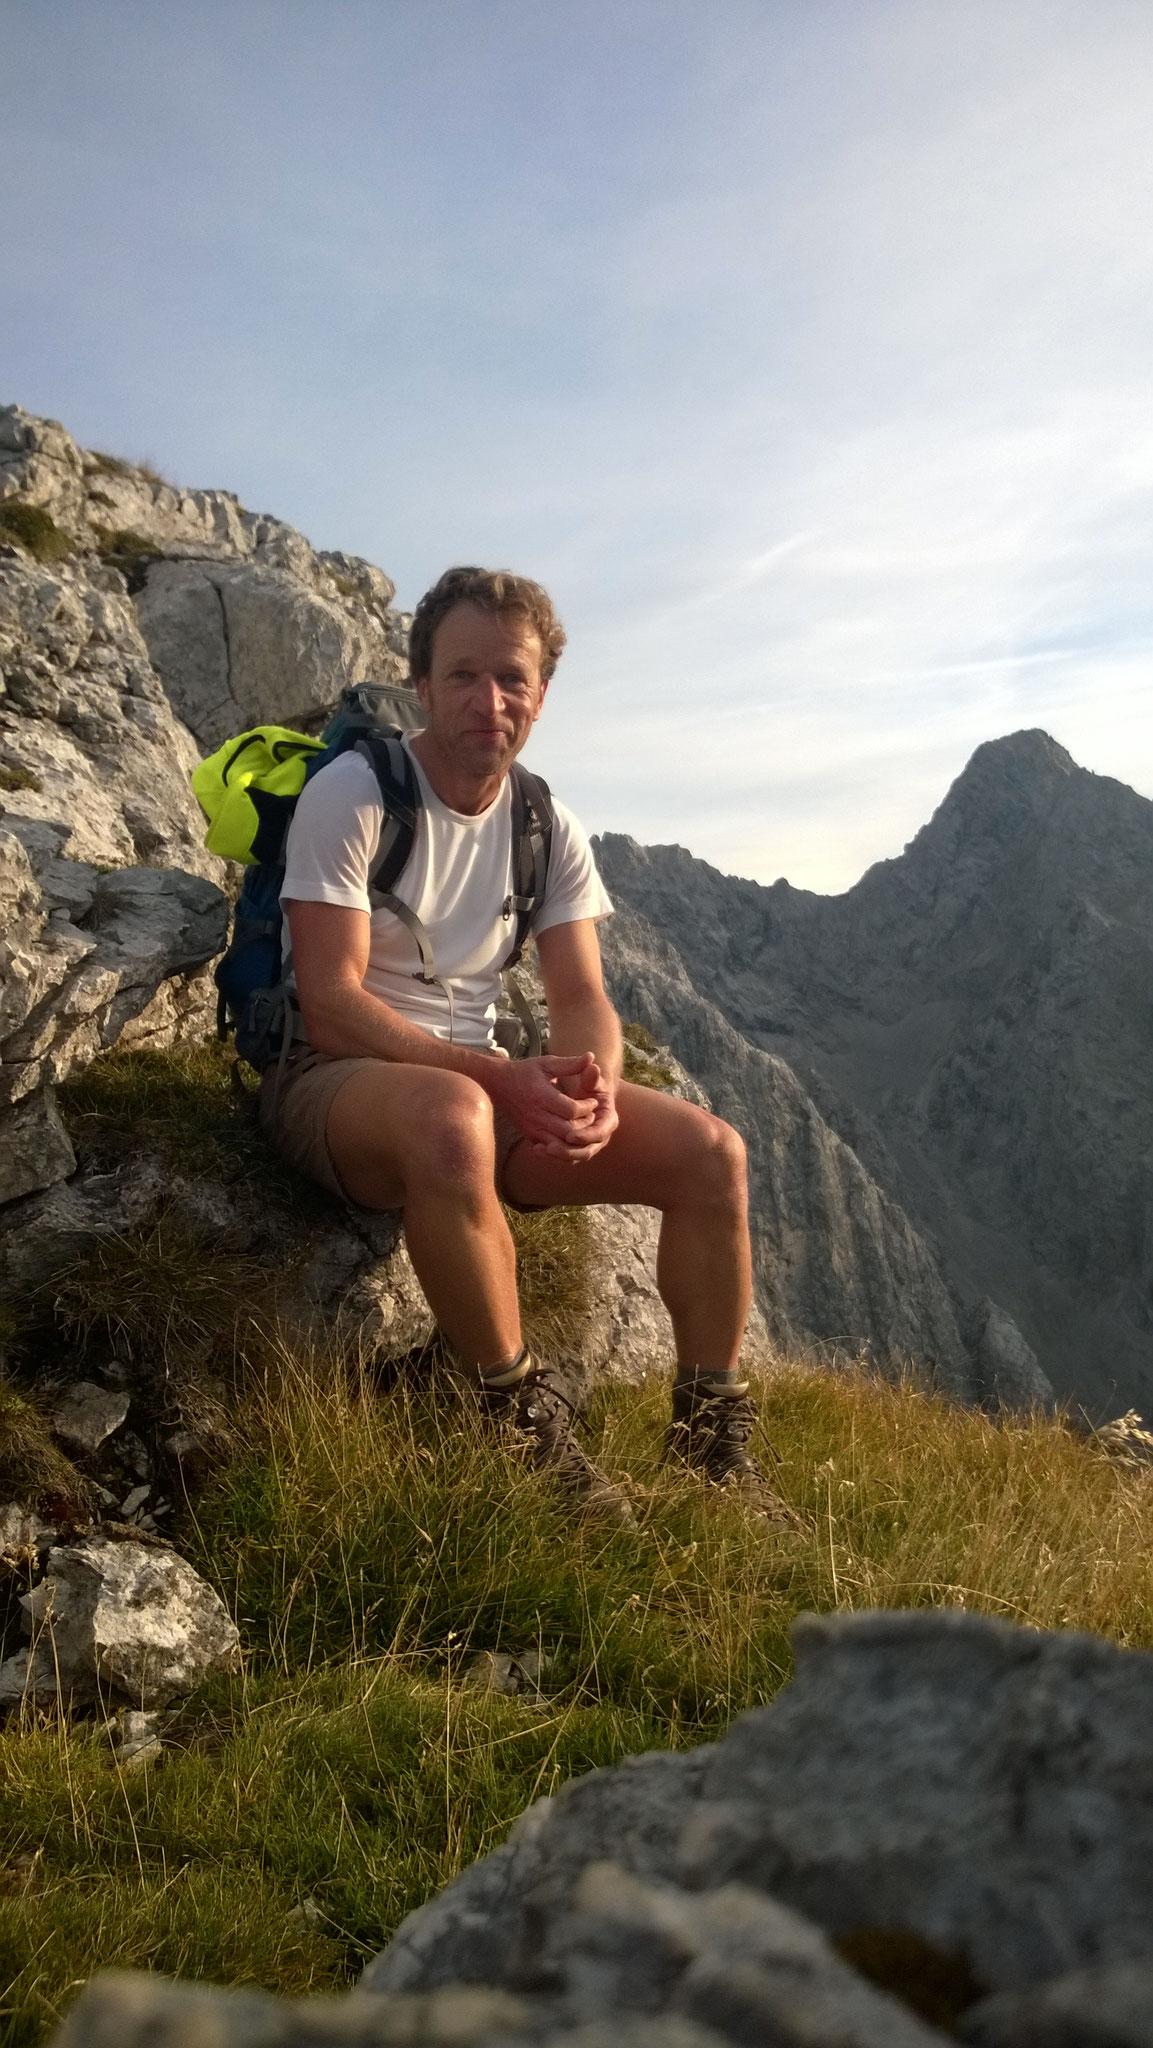 ... Wanderung zur Meiler-Hütte ...